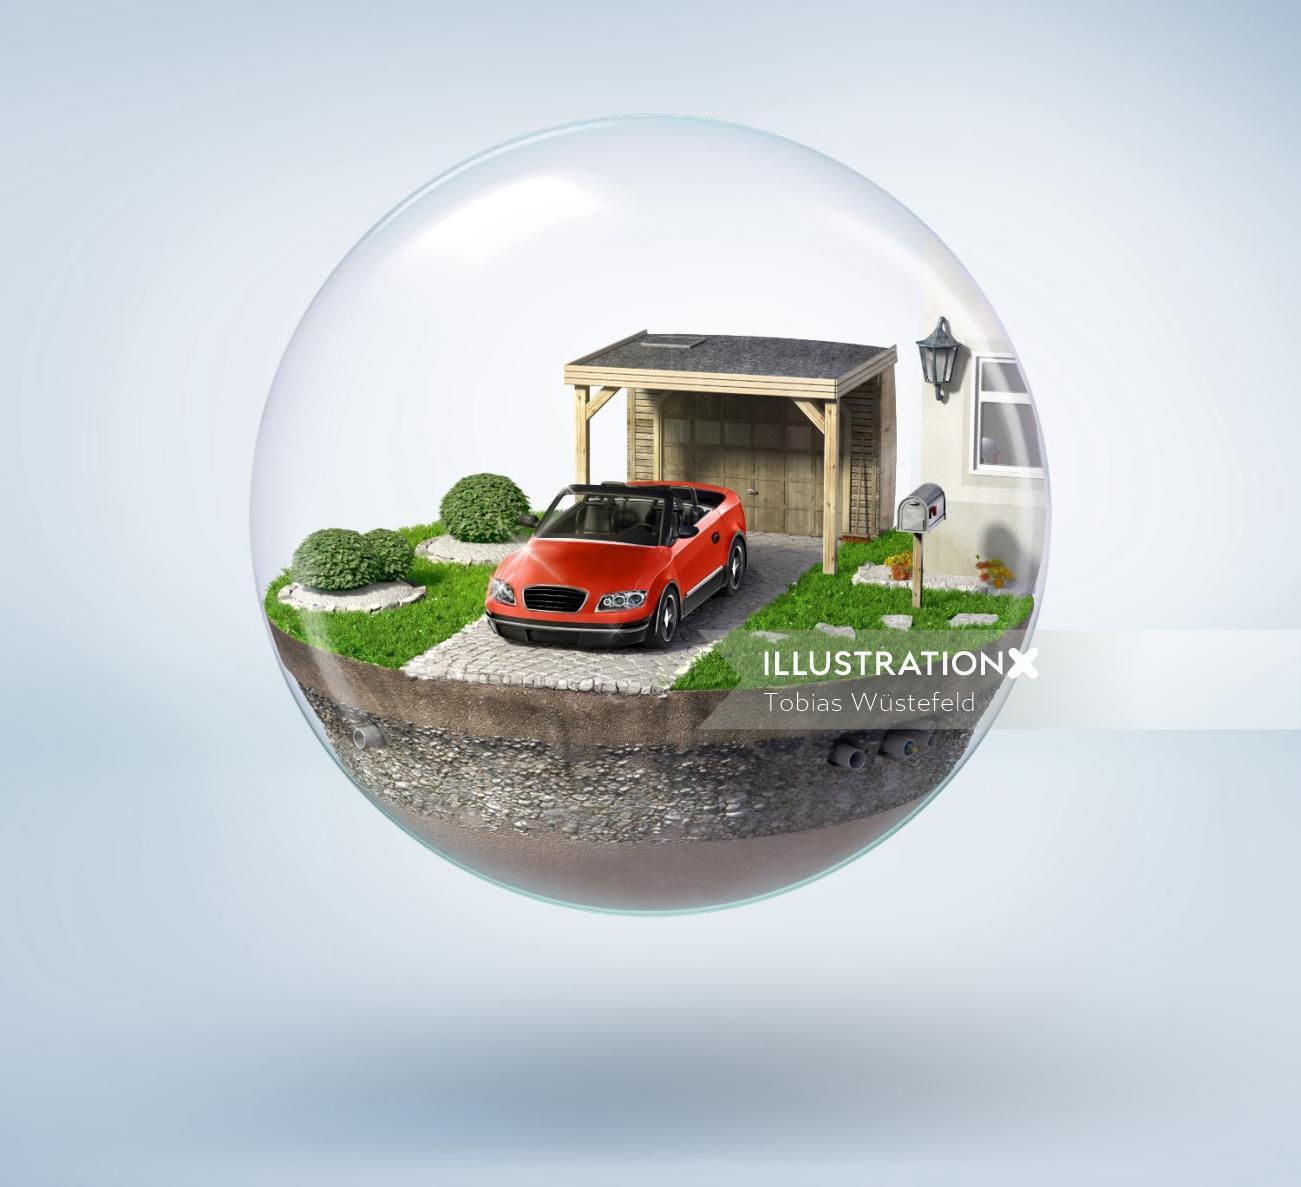 Photorealistic illustration of bubble car parking